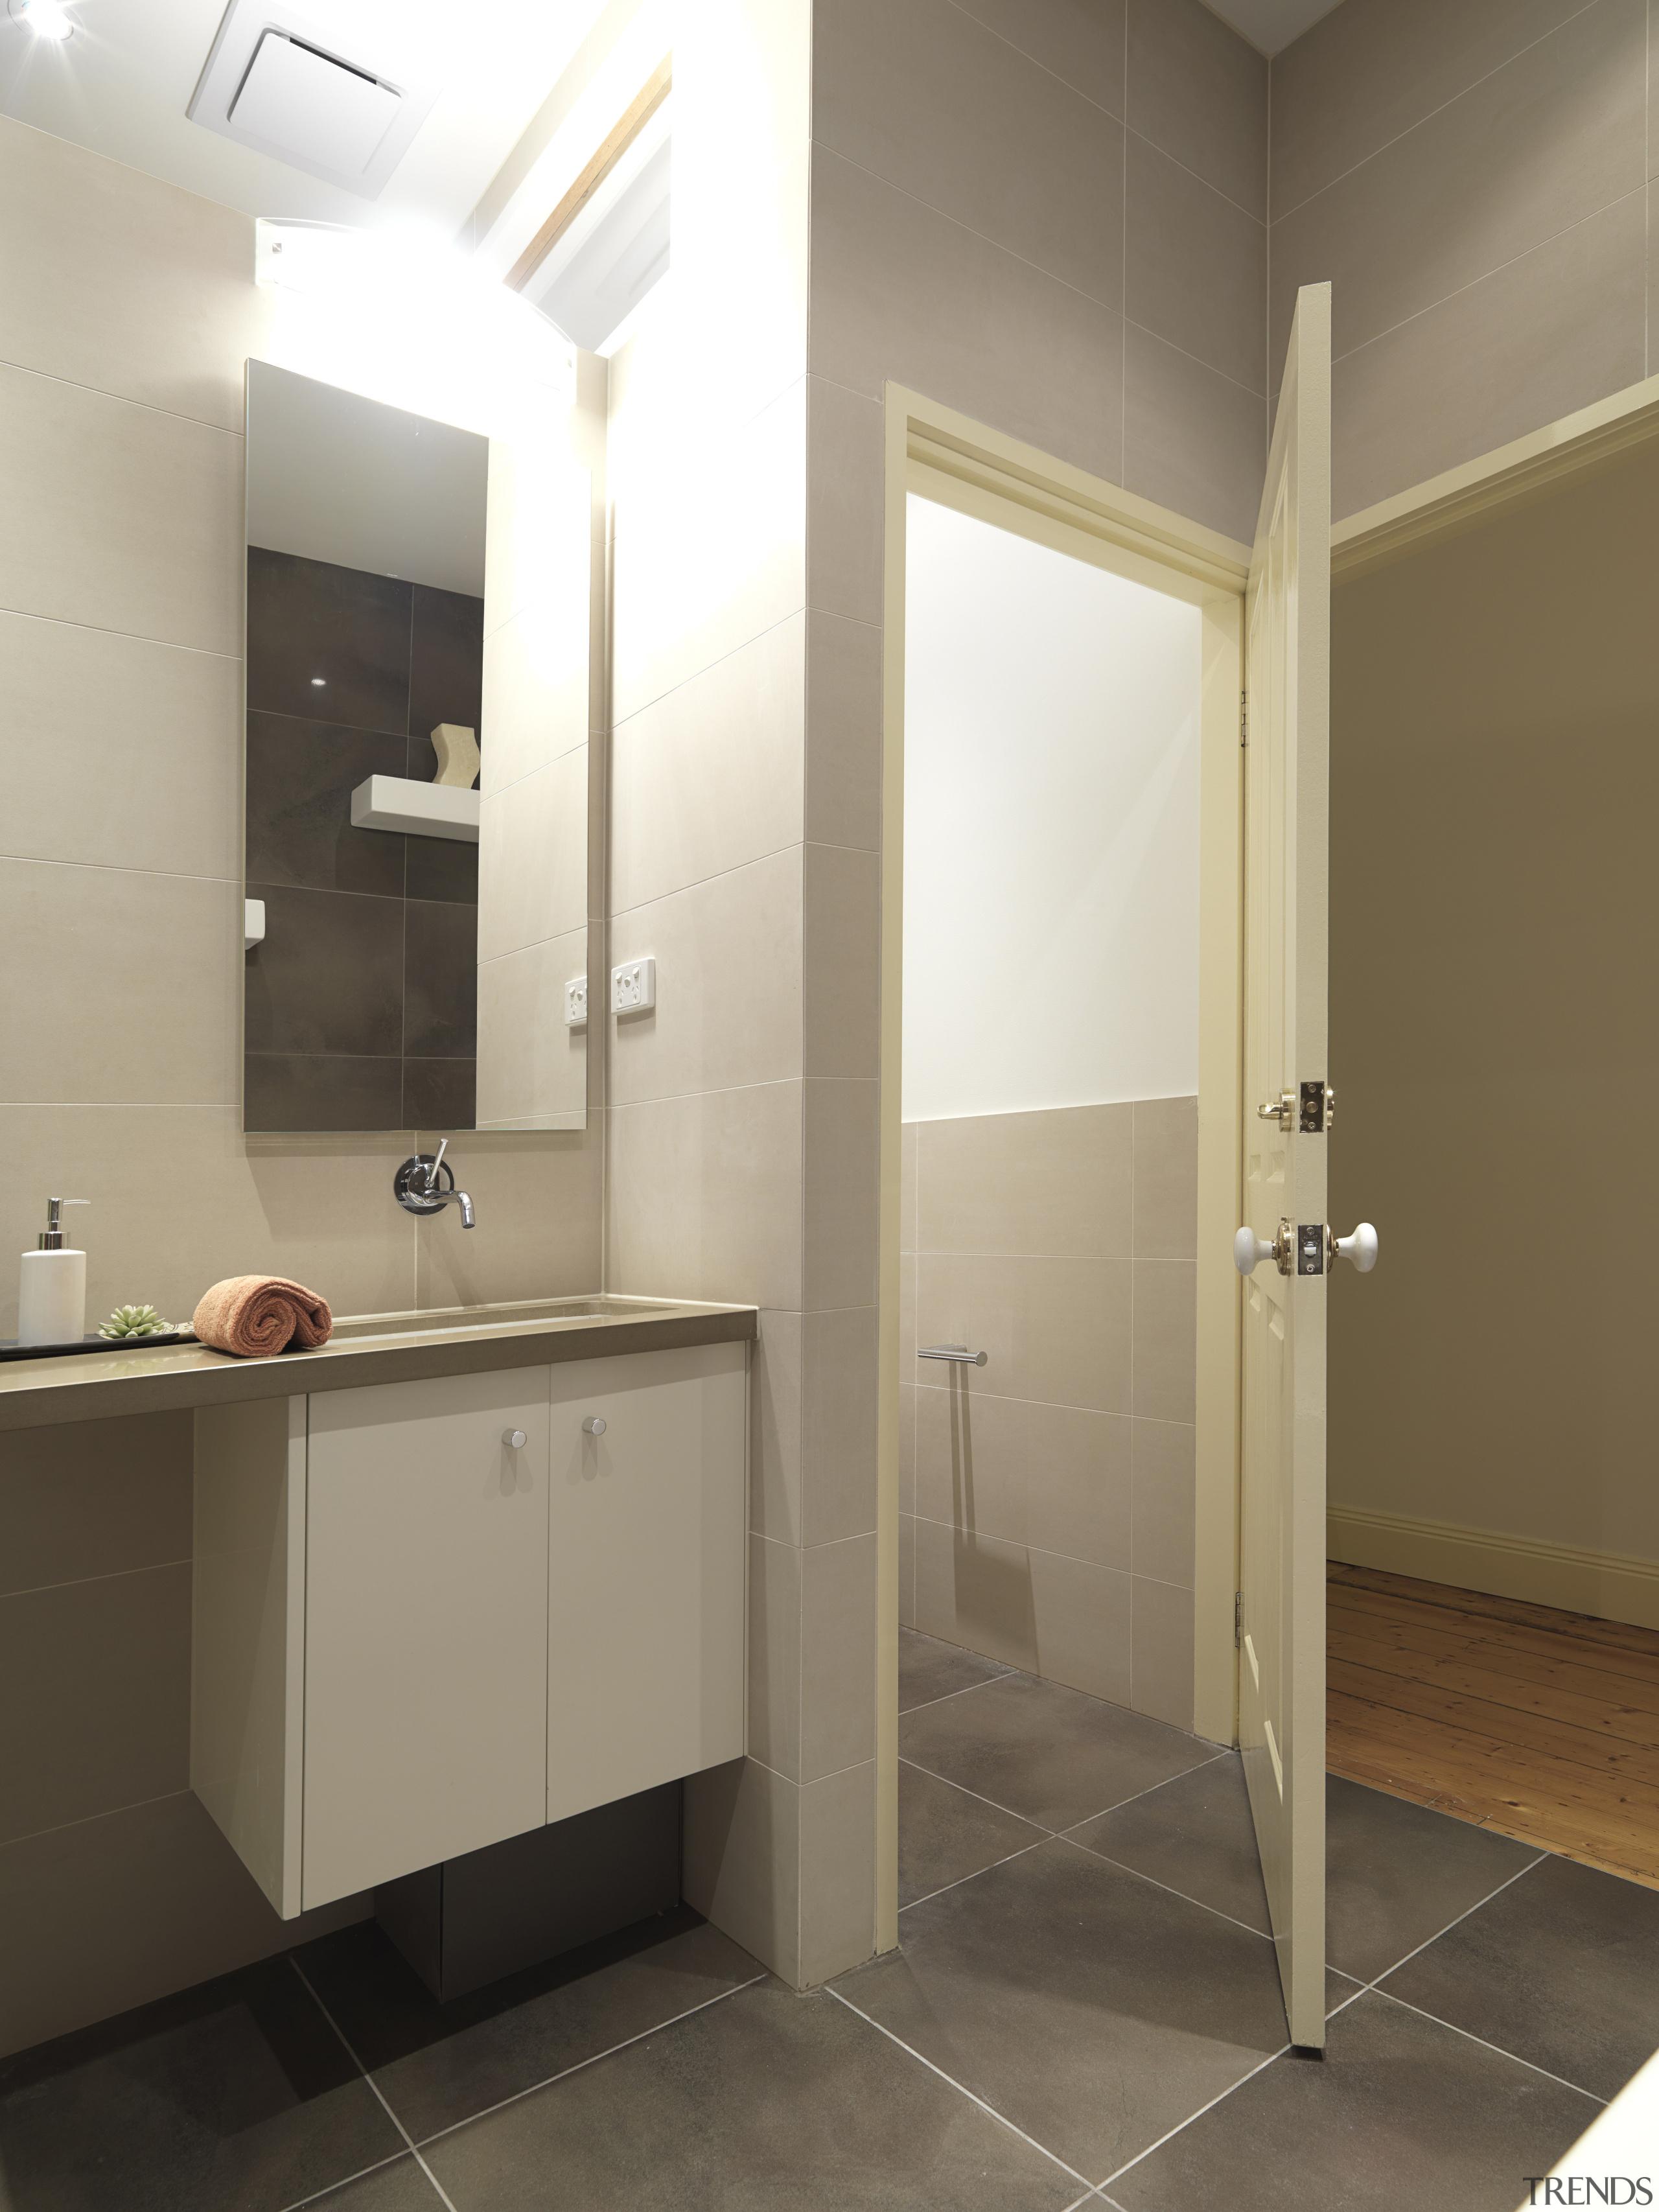 View of bathroom with vanity and toilet, features bathroom, bathroom accessory, floor, interior design, plumbing fixture, product design, room, sink, brown, white